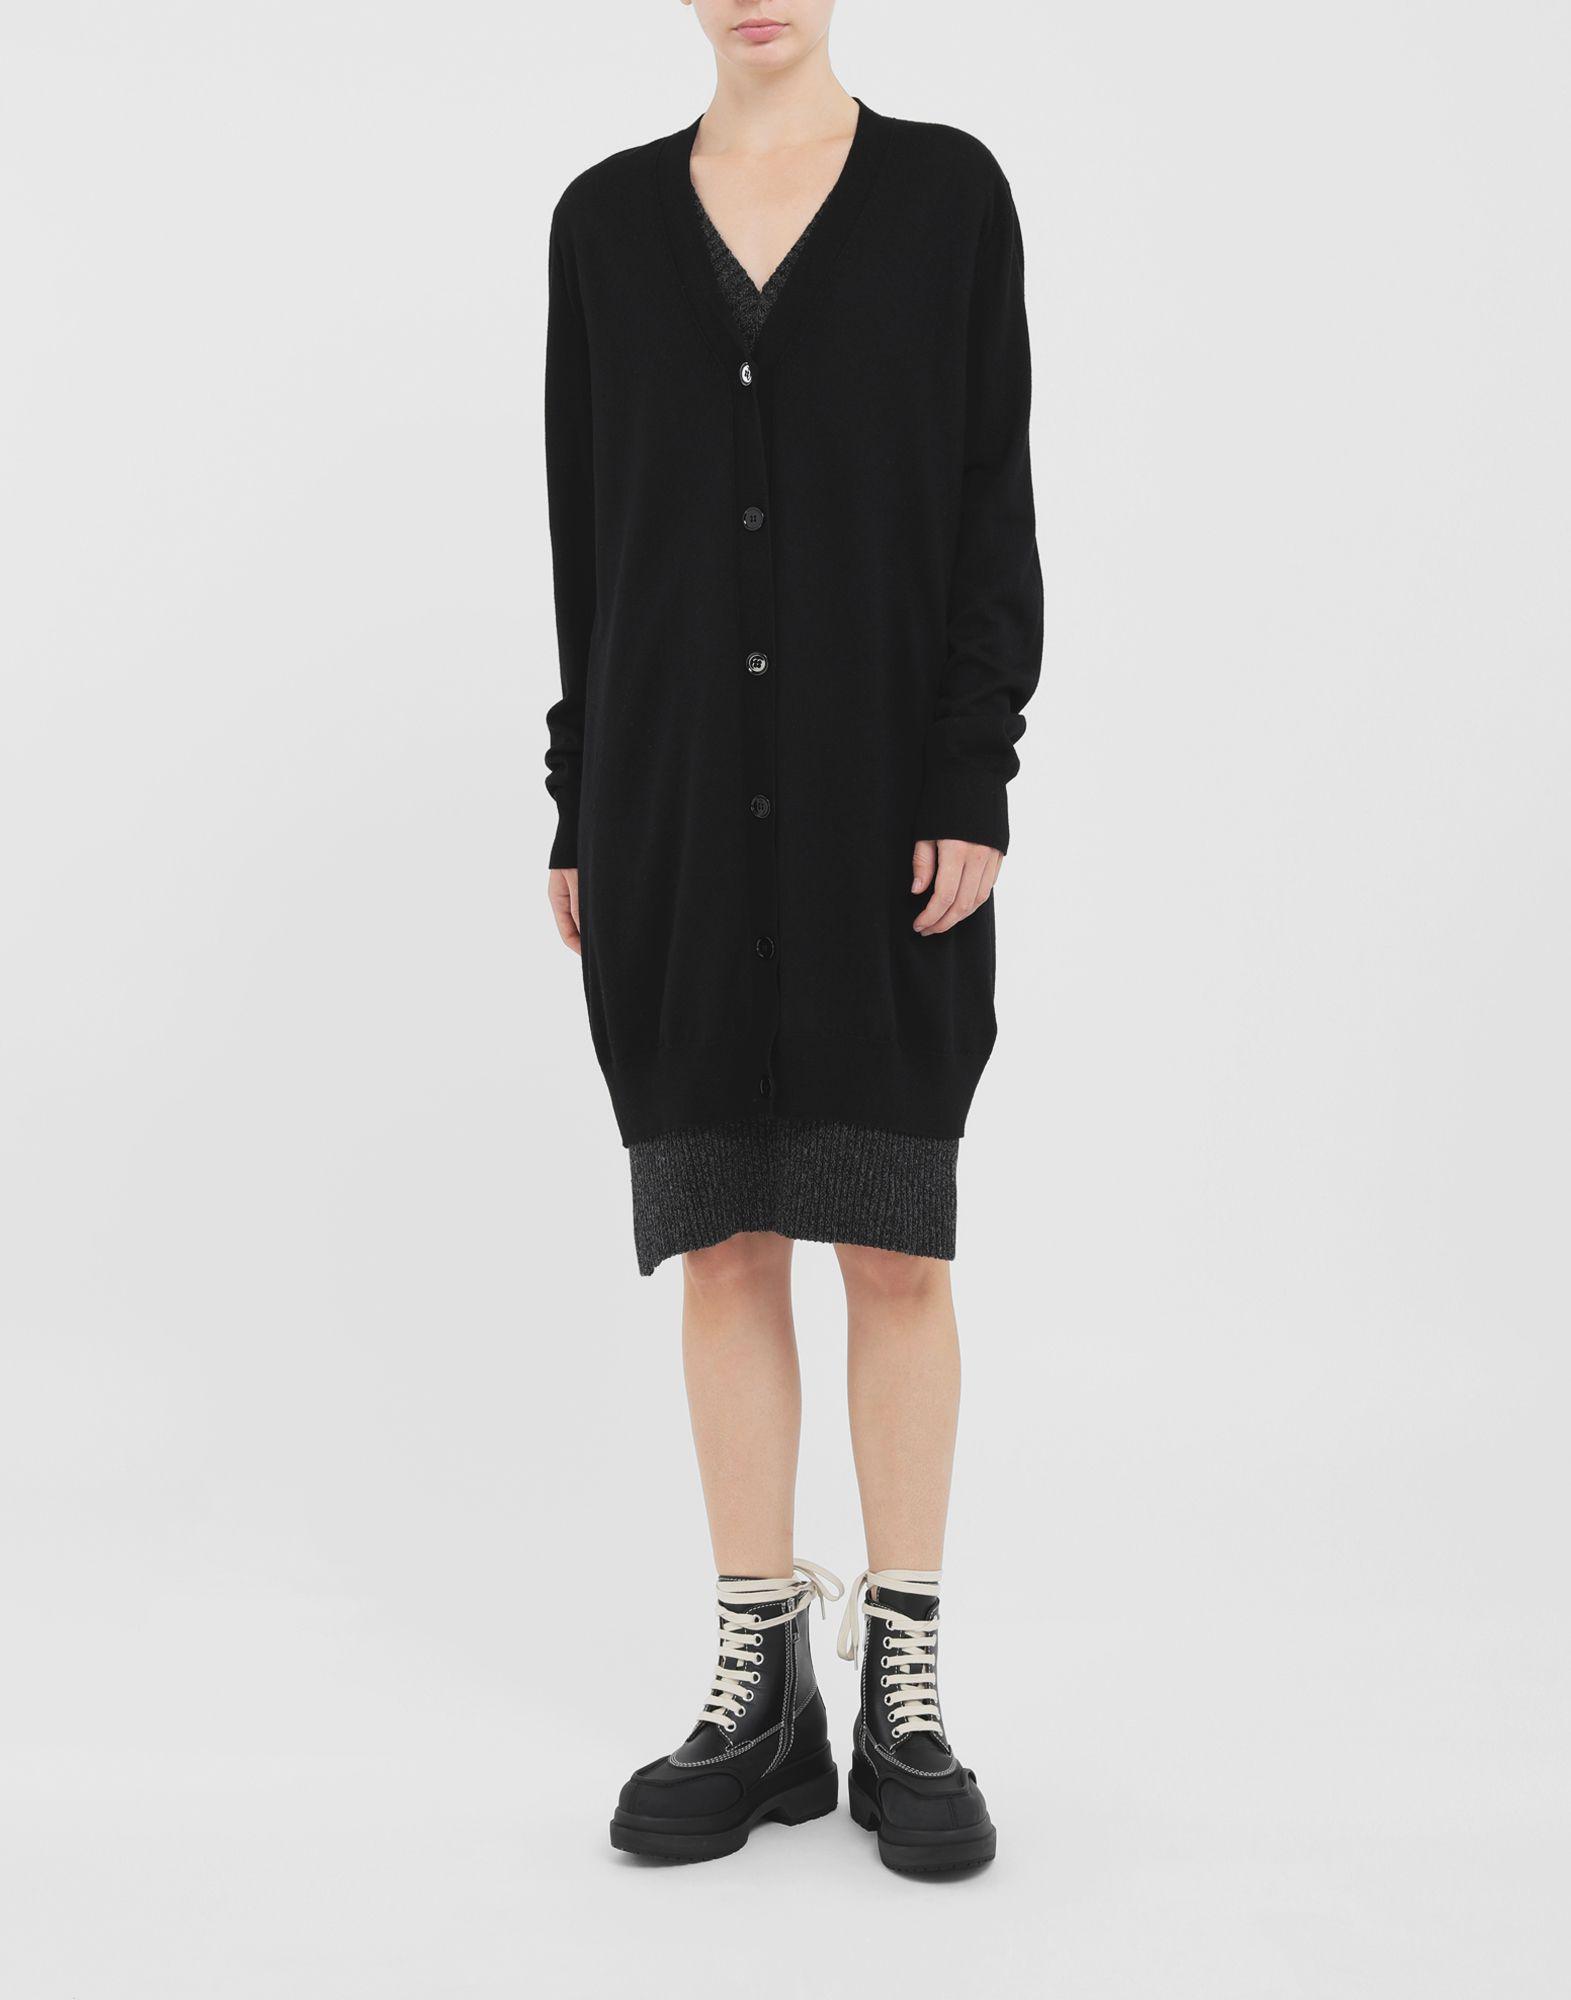 MM6 MAISON MARGIELA Multi-wear cardigan dress Dress Woman r